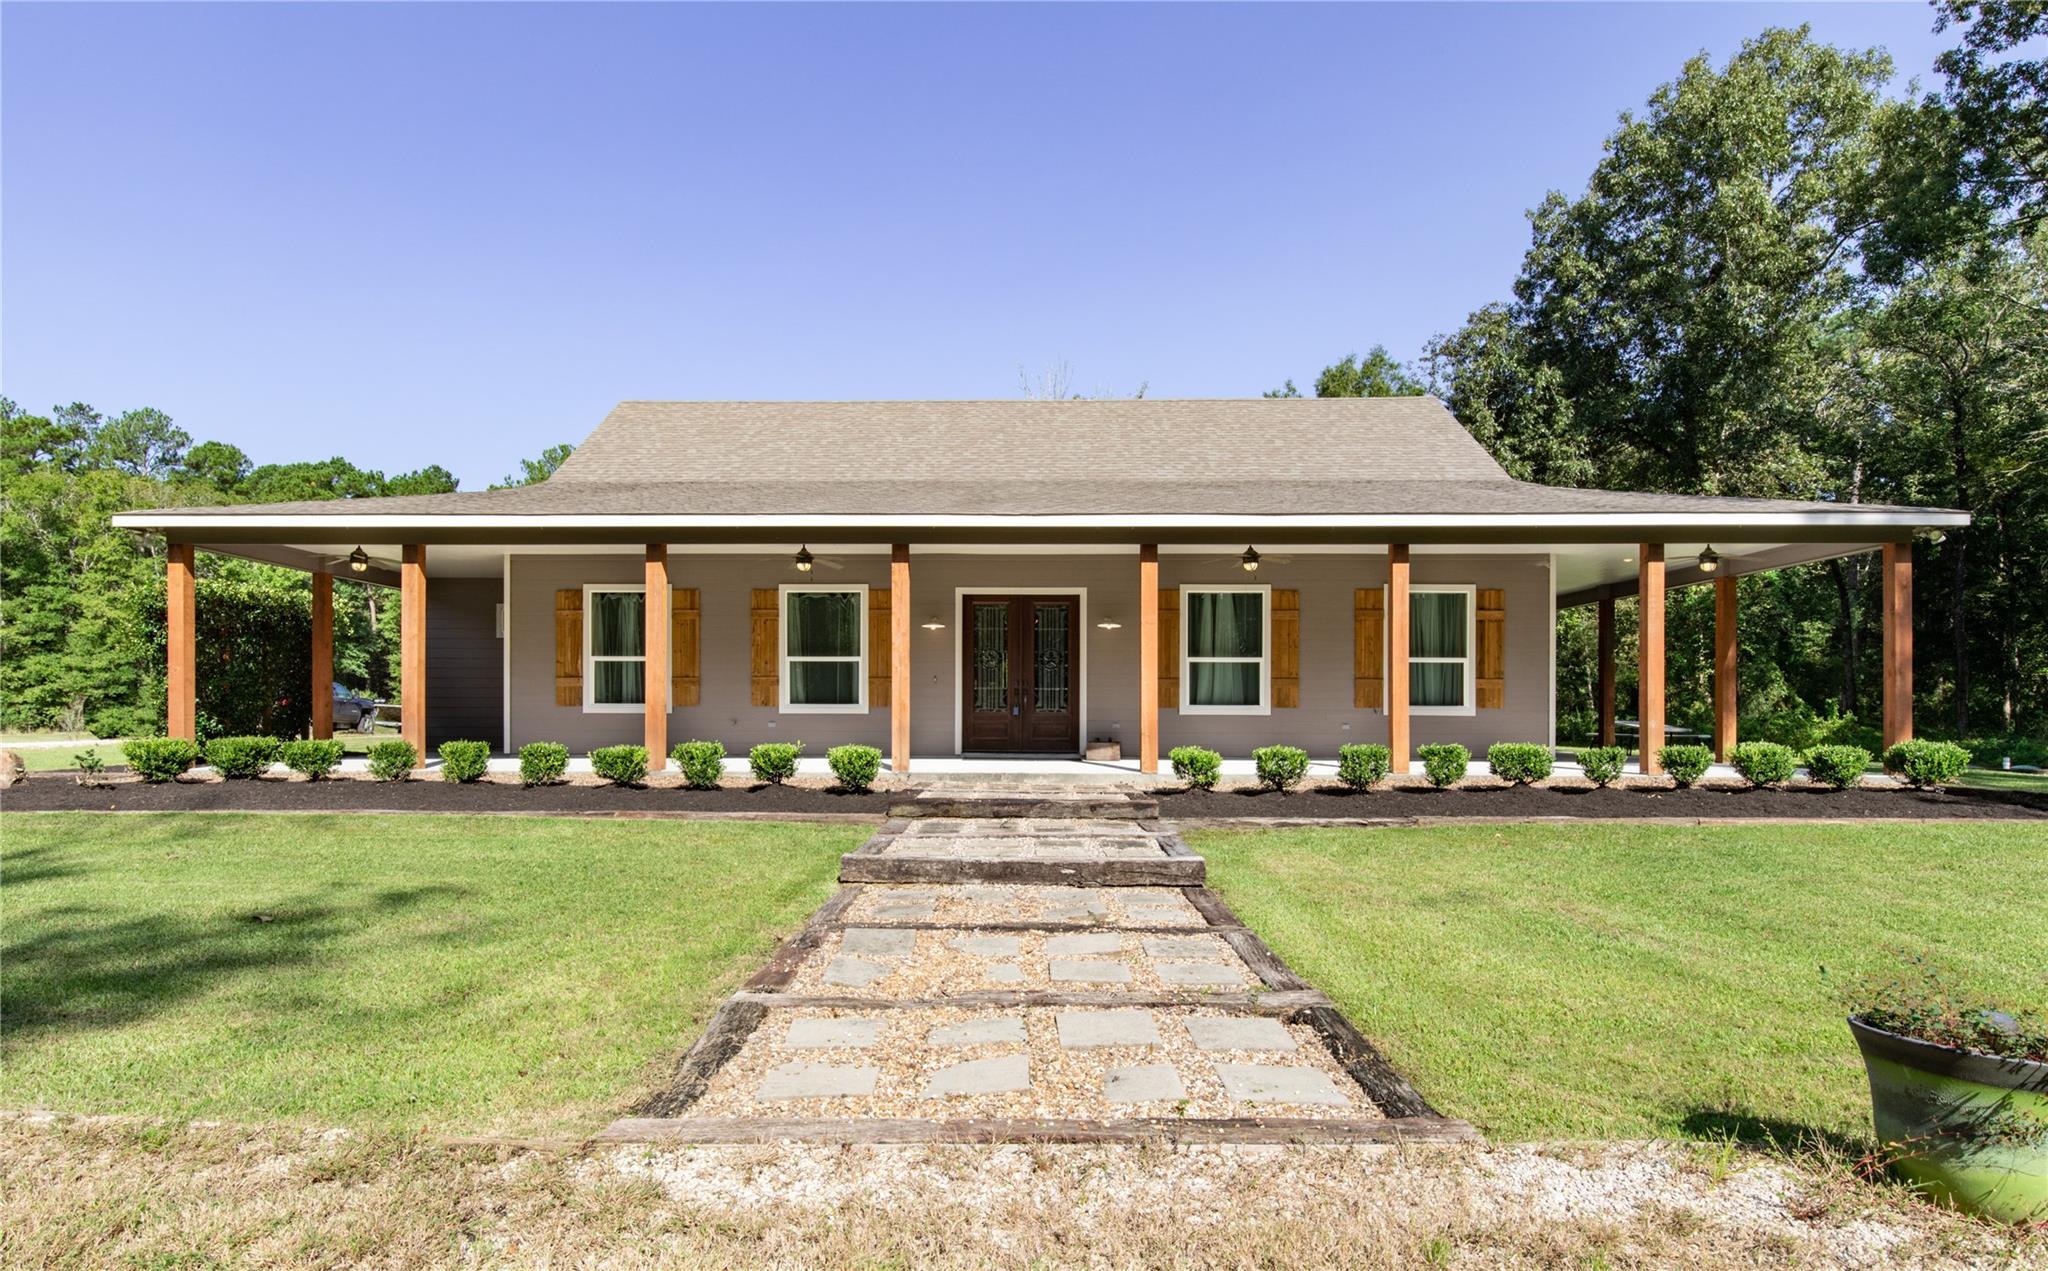 9075 Fm 1008 Property Photo - Dayton, TX real estate listing